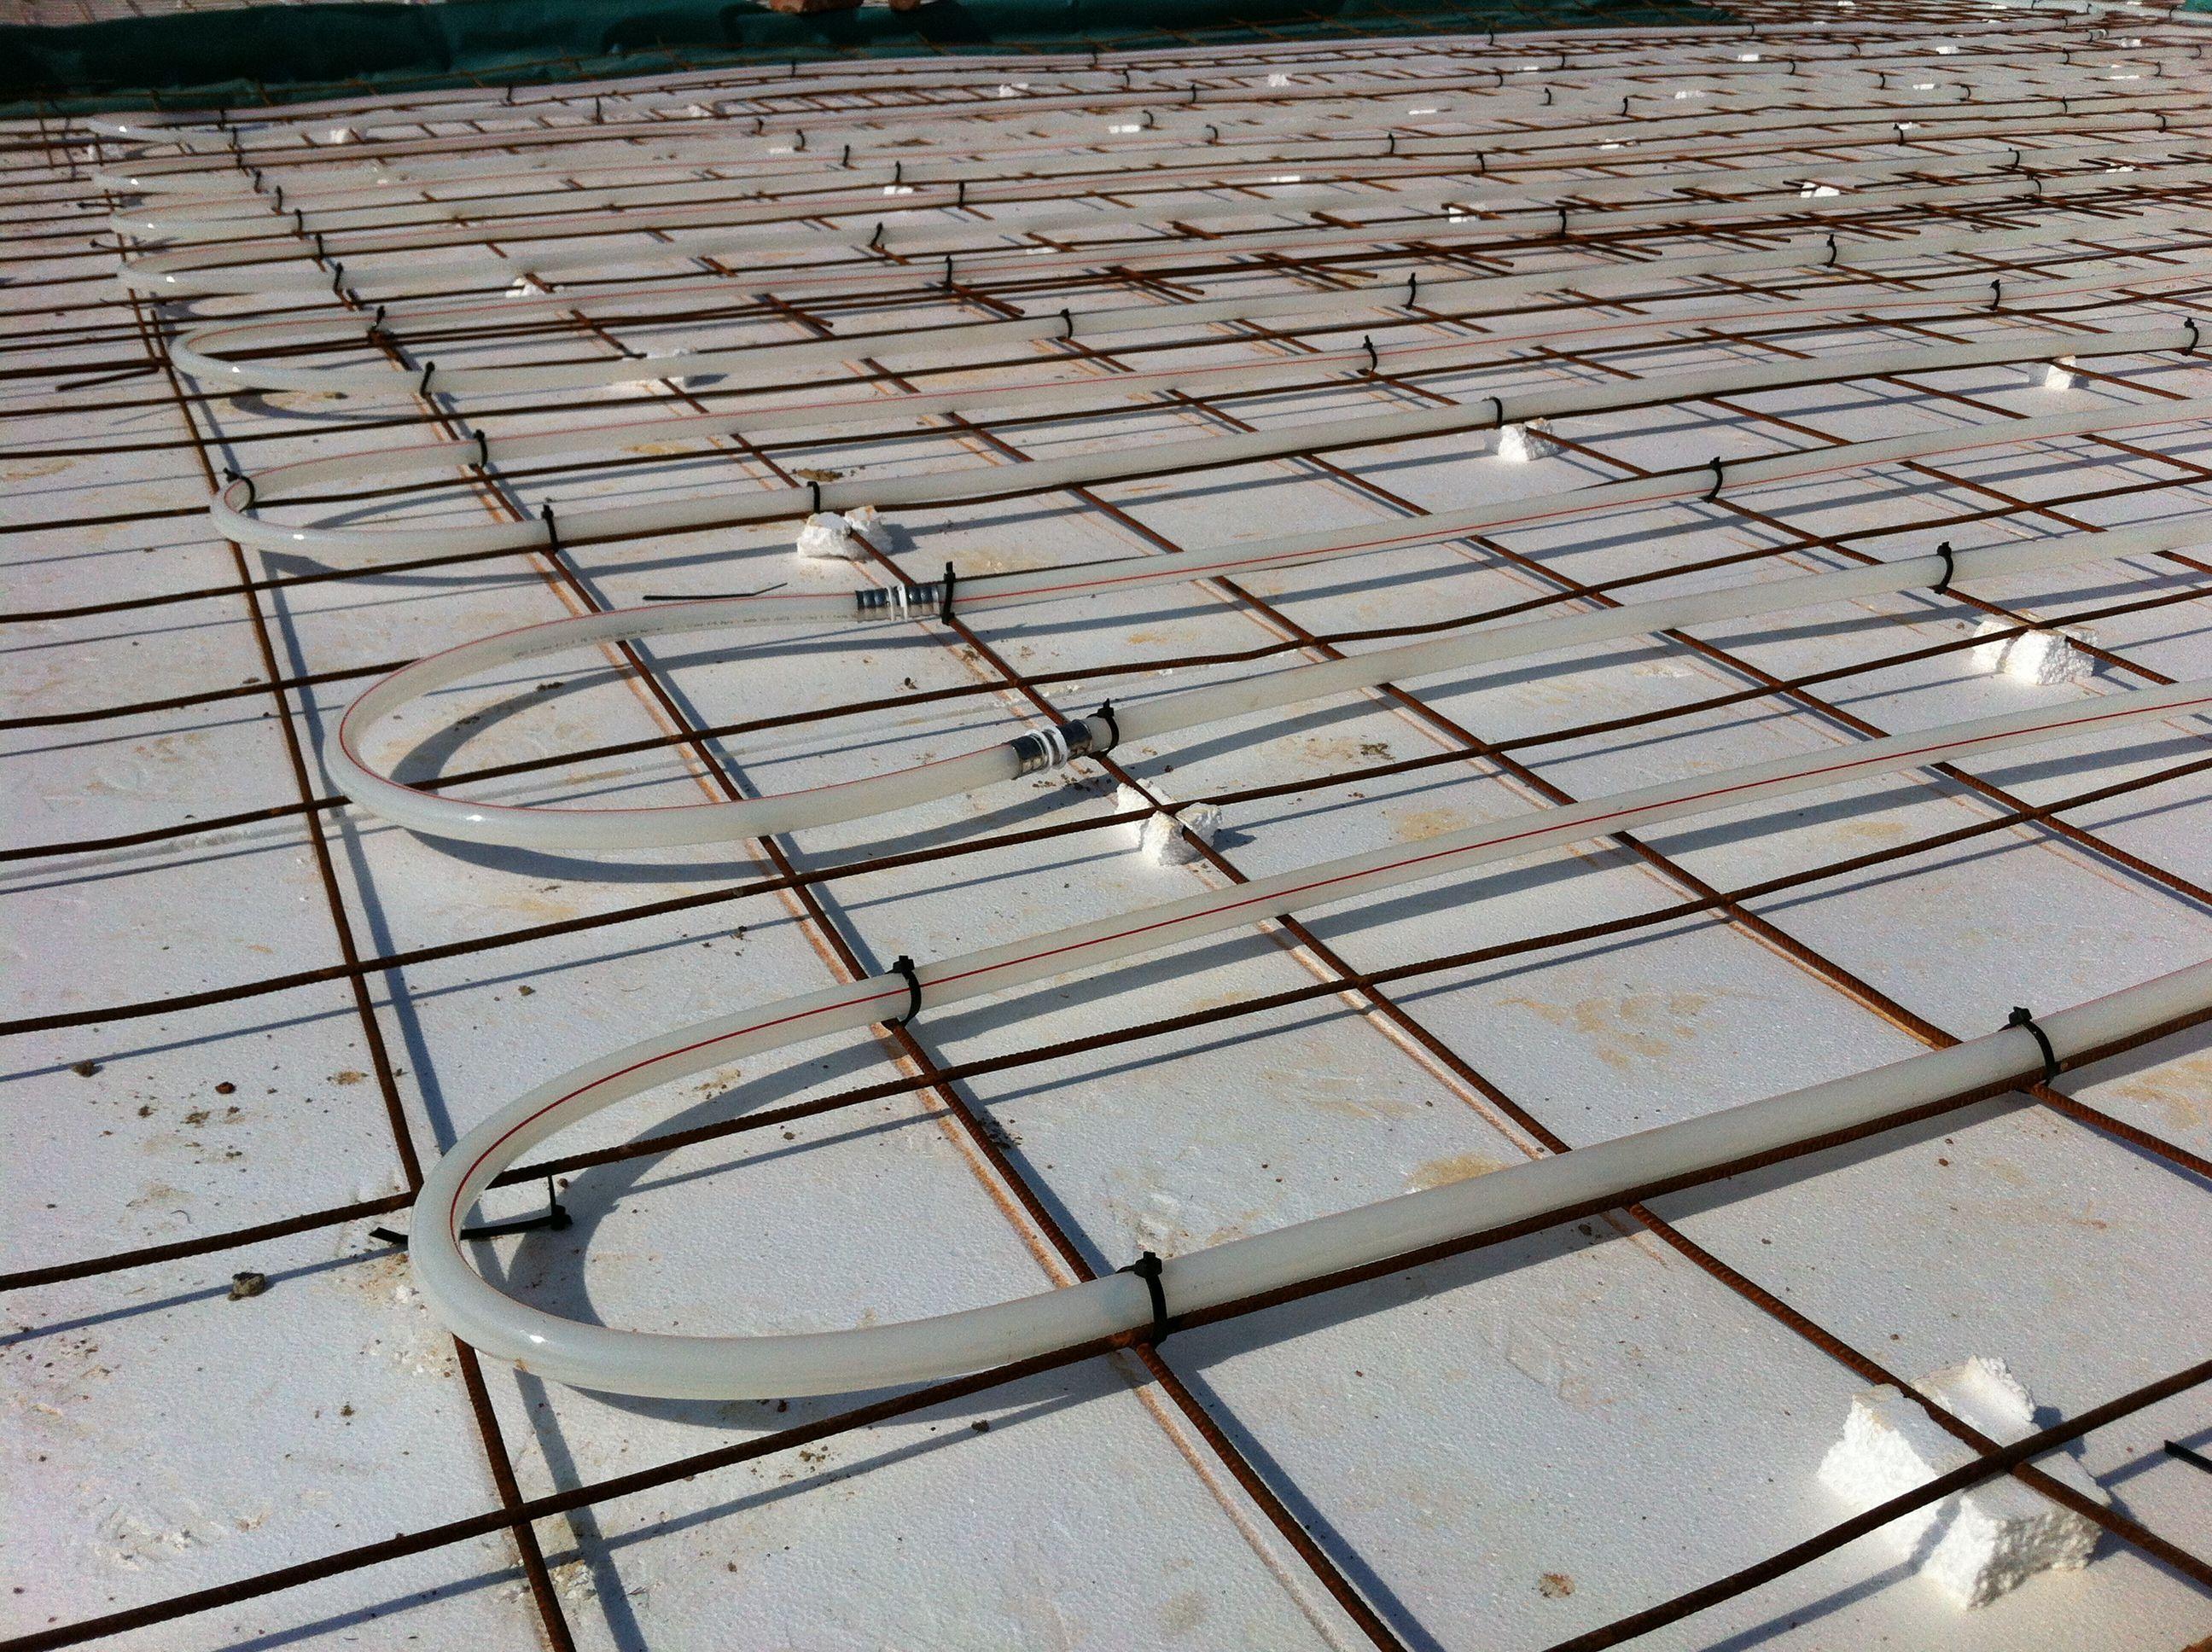 hight resolution of we added eco friendly underfloor heating hot water